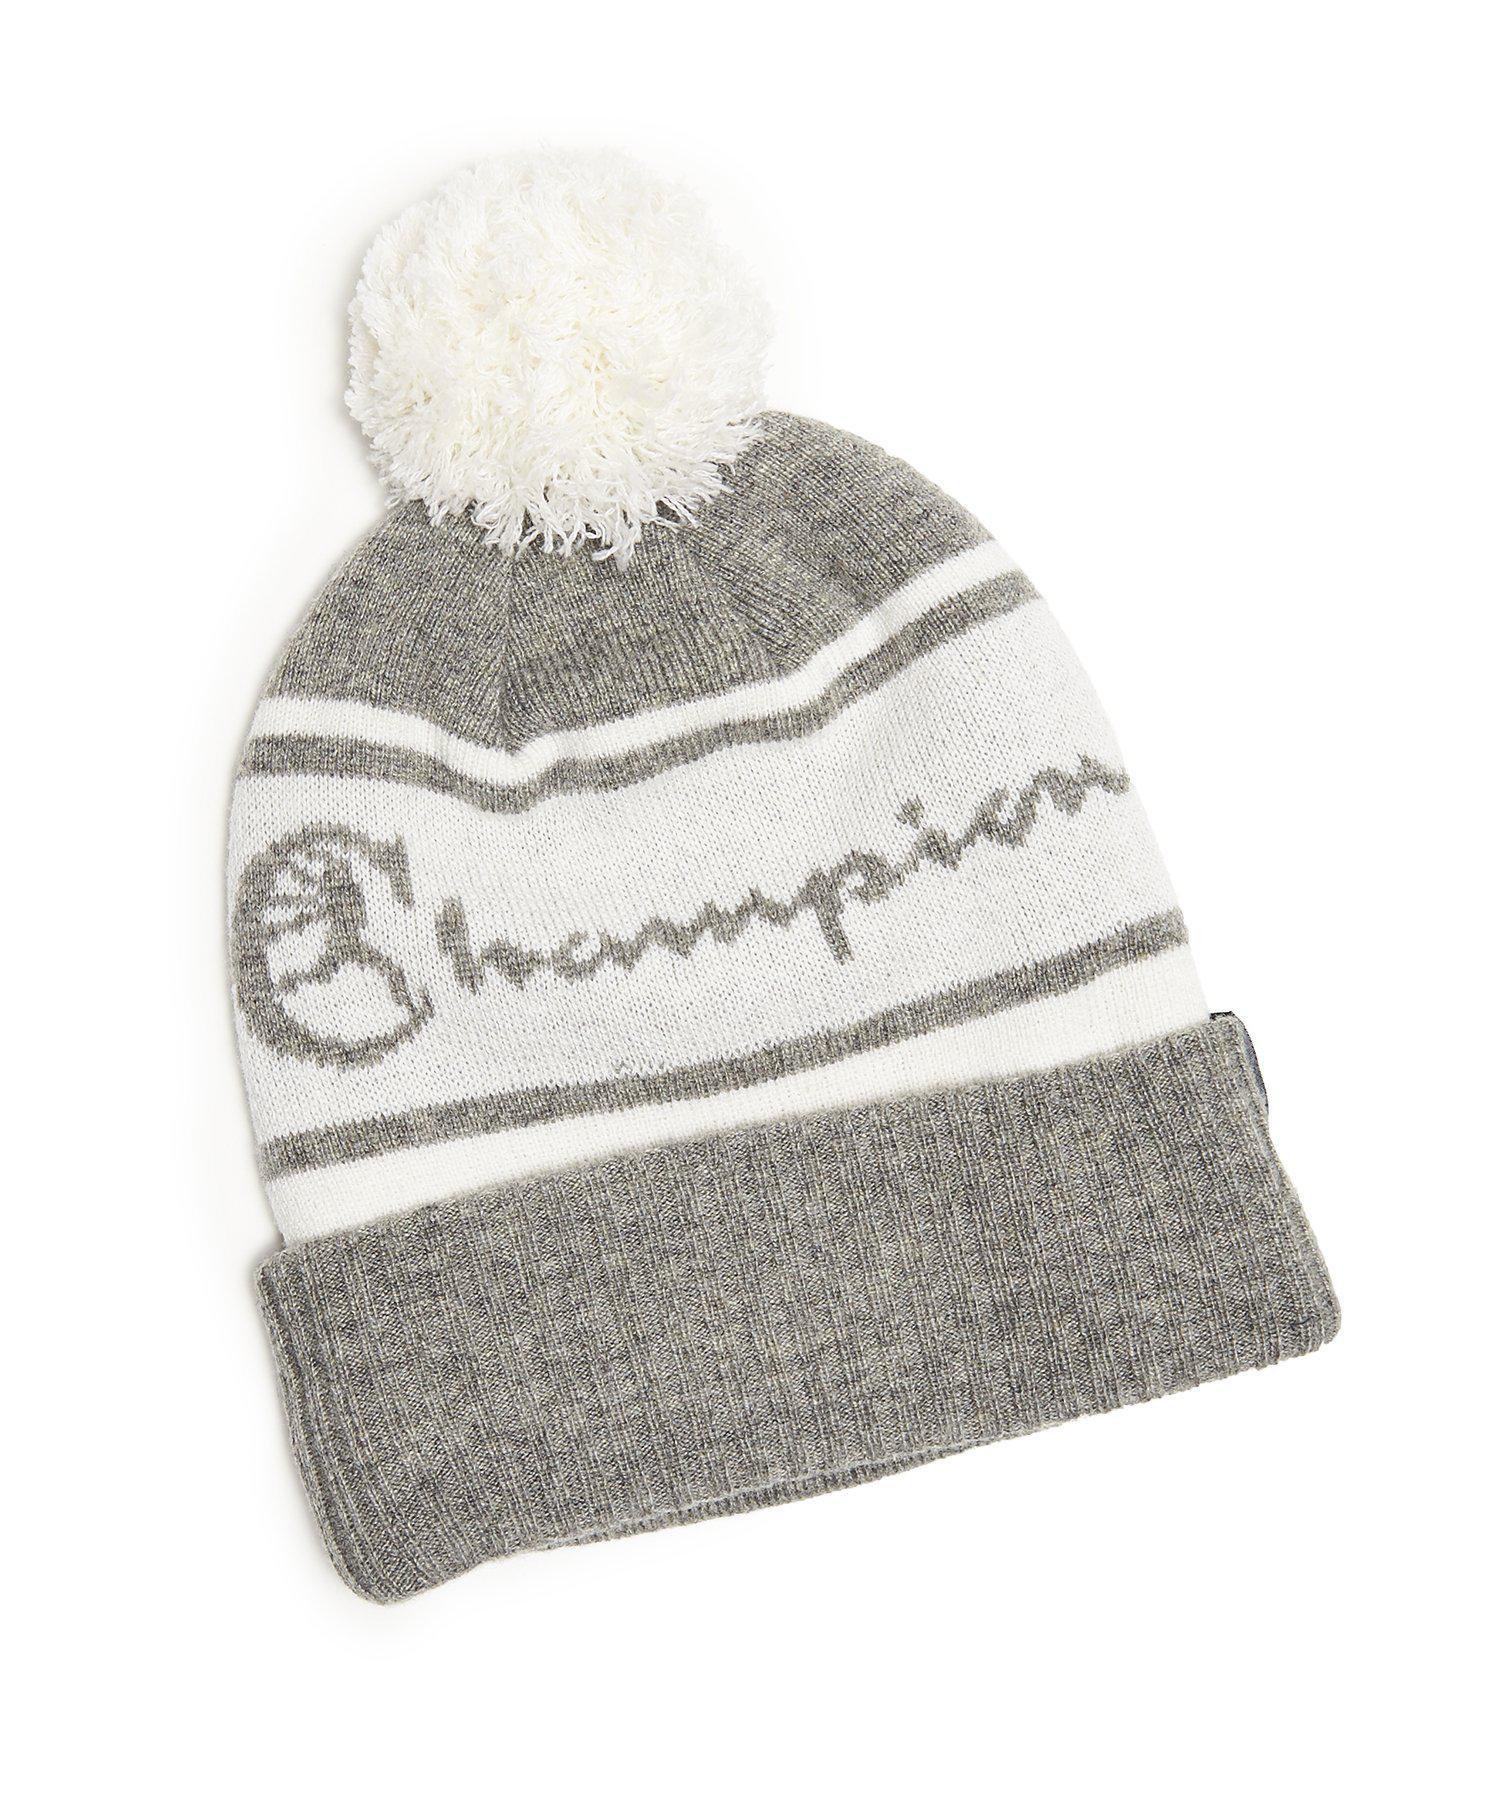 b40b35de3e0 New Era Hats Champion + New Era Pom Pom Beanie In Grey in Gray for ...